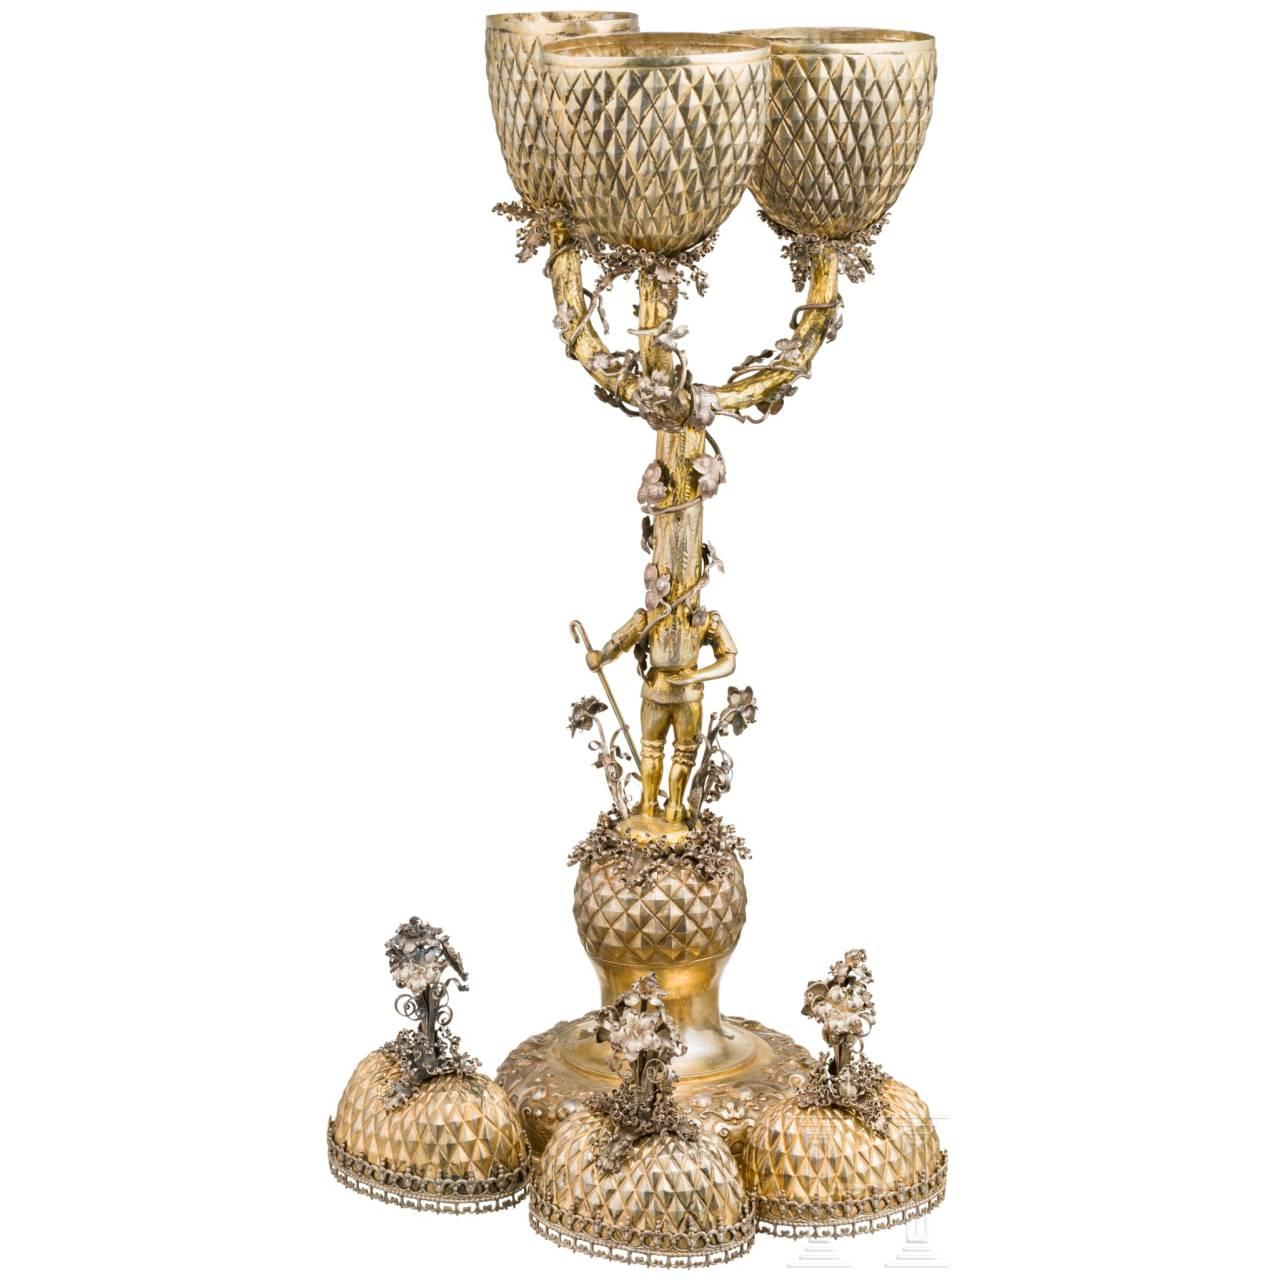 A German three-branch pineapple trophy, set with diamonds, circa 1900